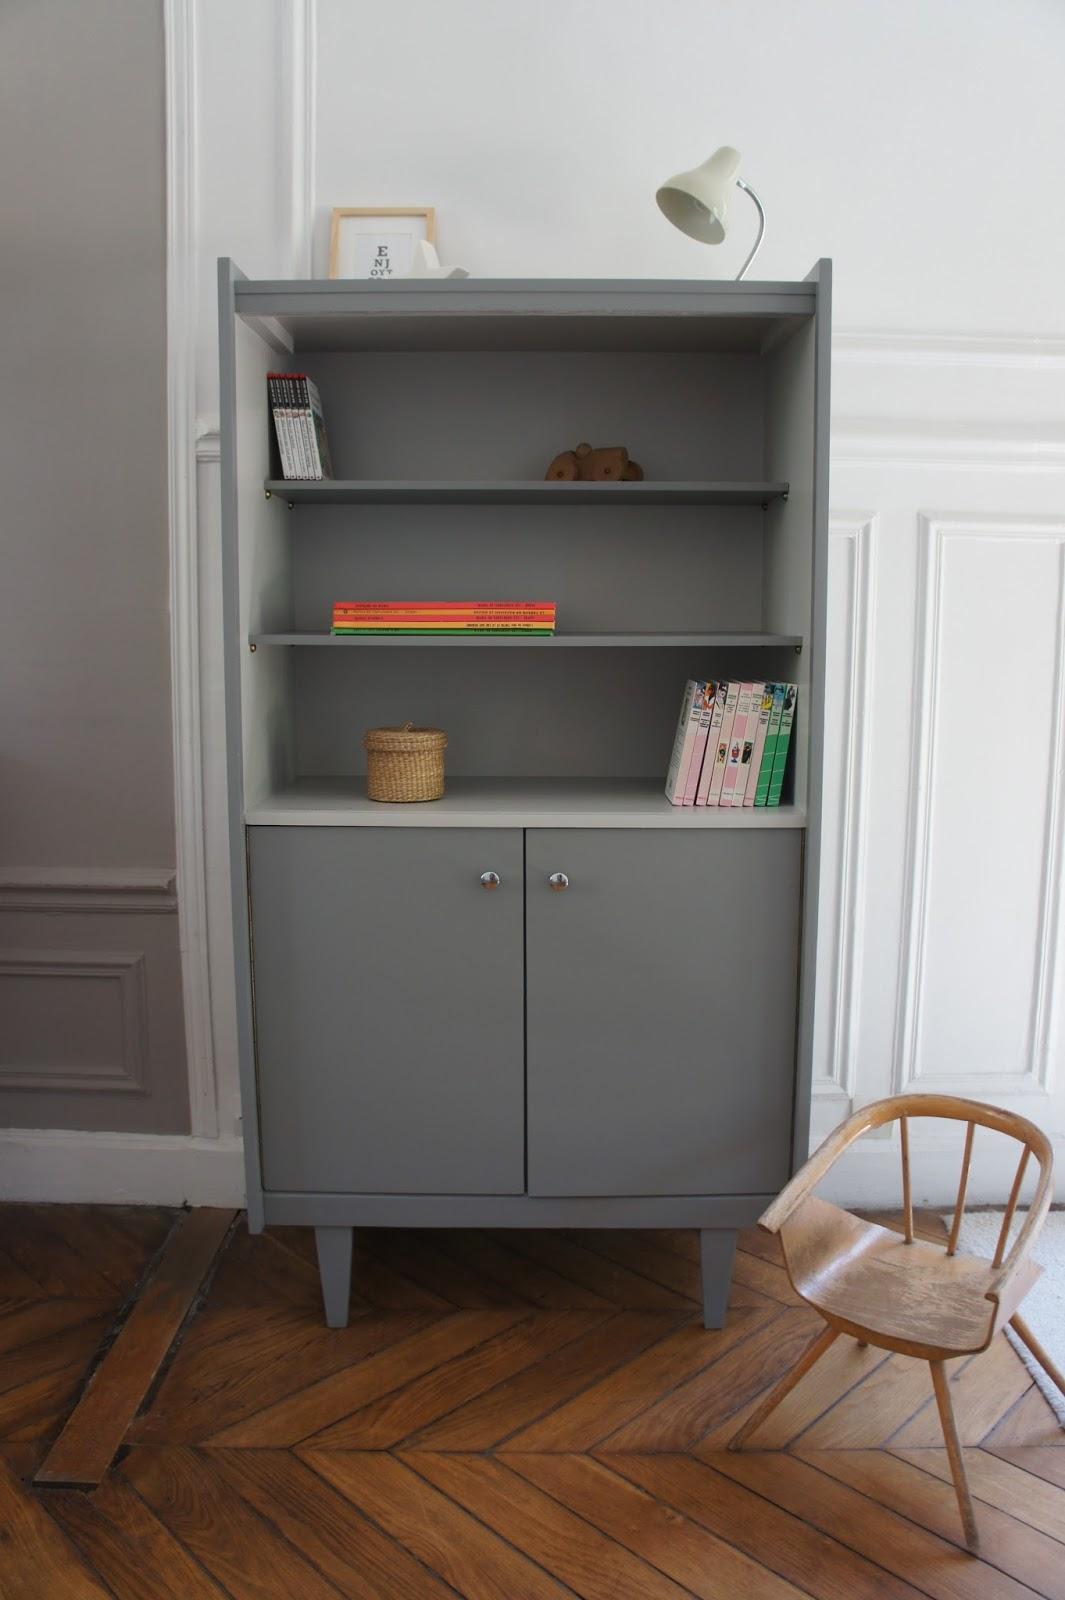 atelier petit toit la biblioth que vintage de nomino. Black Bedroom Furniture Sets. Home Design Ideas